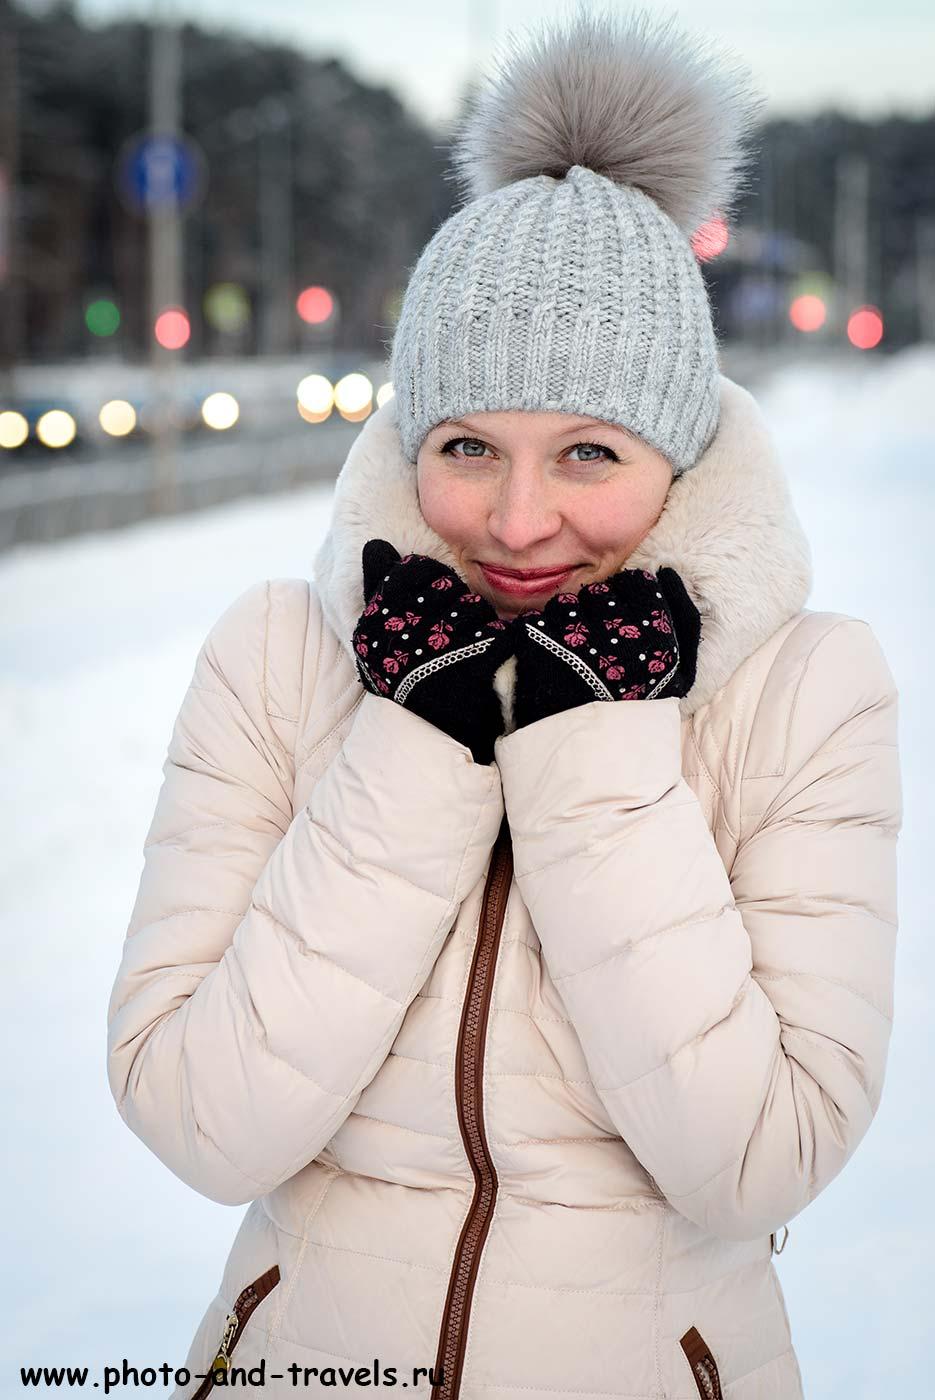 12. Прогулка на морозе. Портрет, снятый на макрообъектив Тамрон 90/2,8 (А, 90мм, f5.6, 1/125сек, ISO 250).